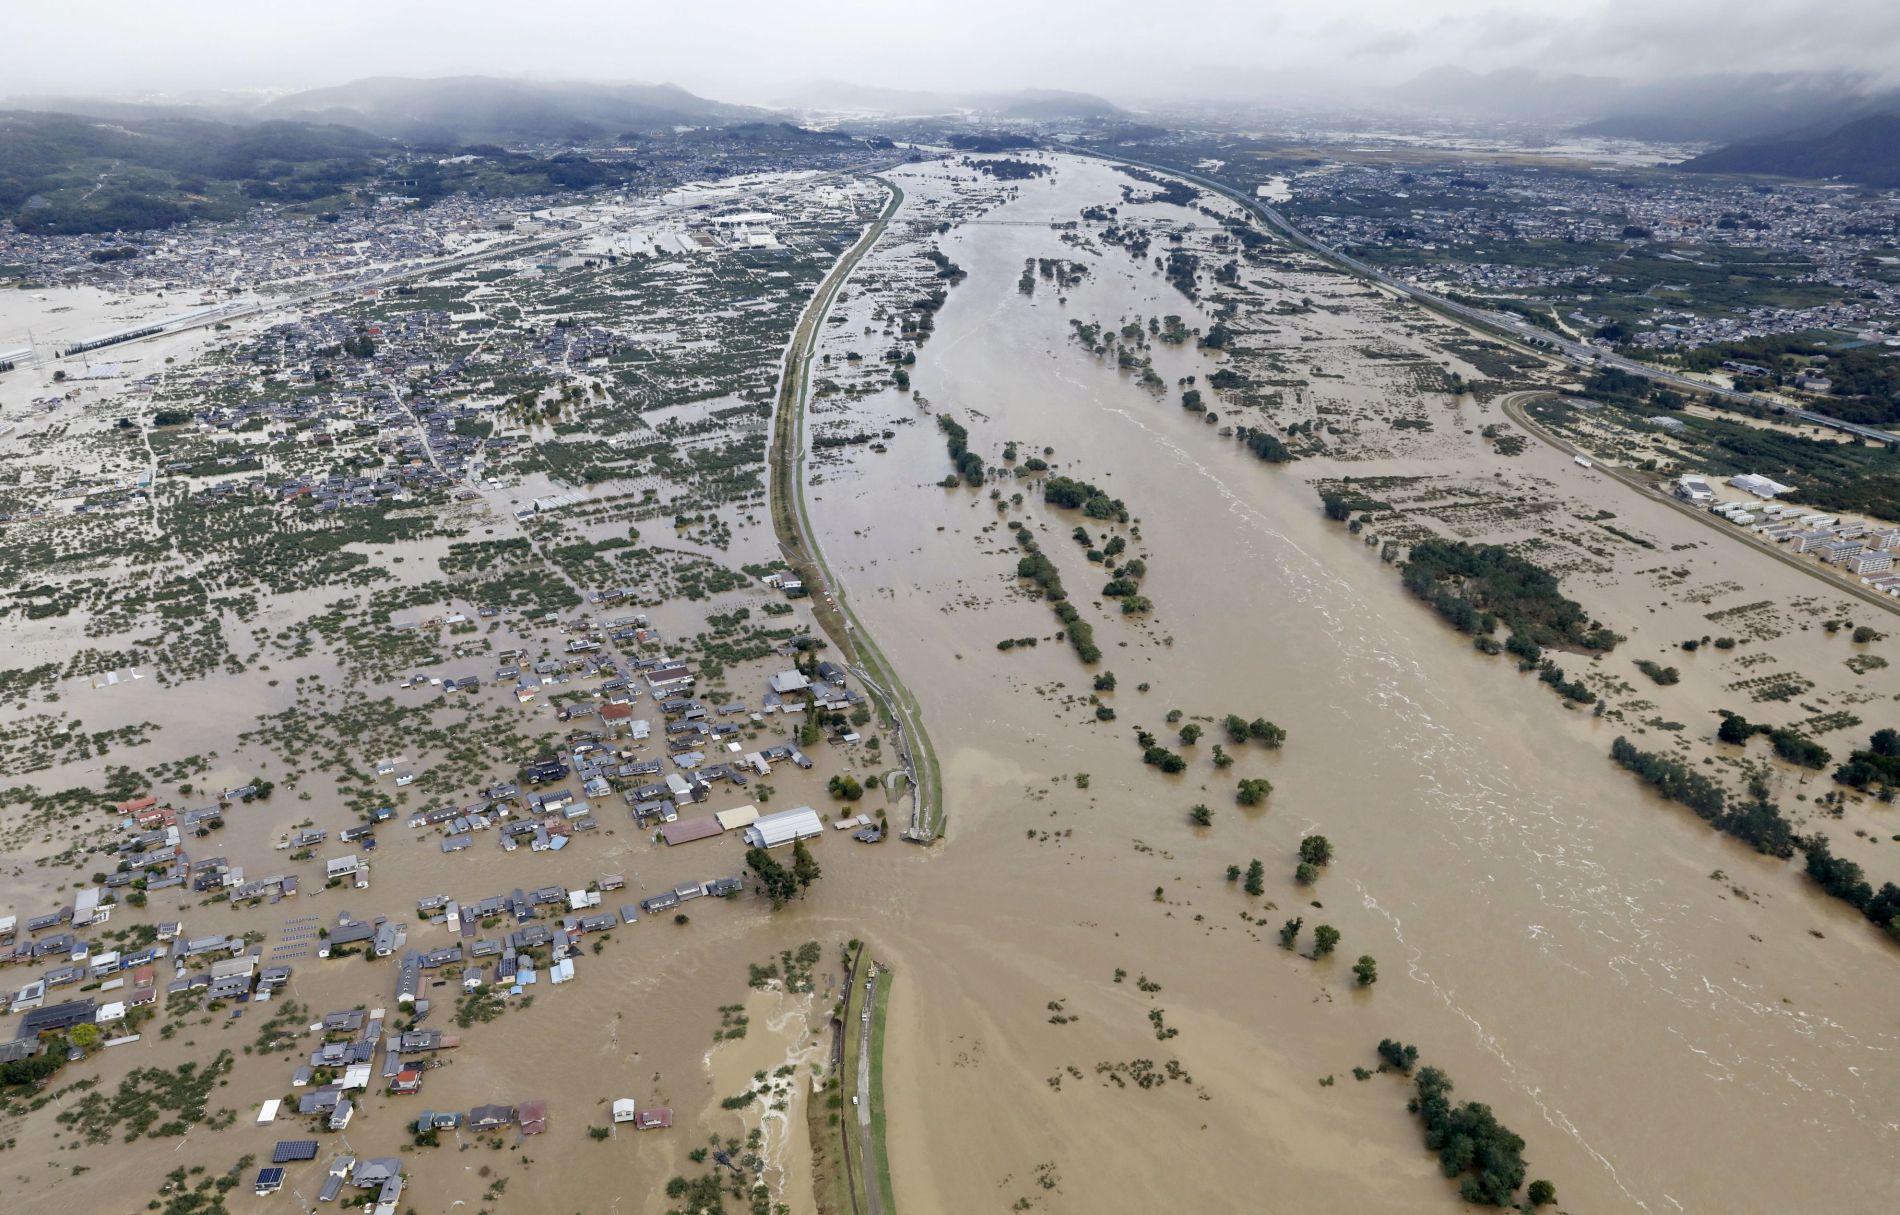 Aftermath of Super Typhoon Hagibis in Japan 008